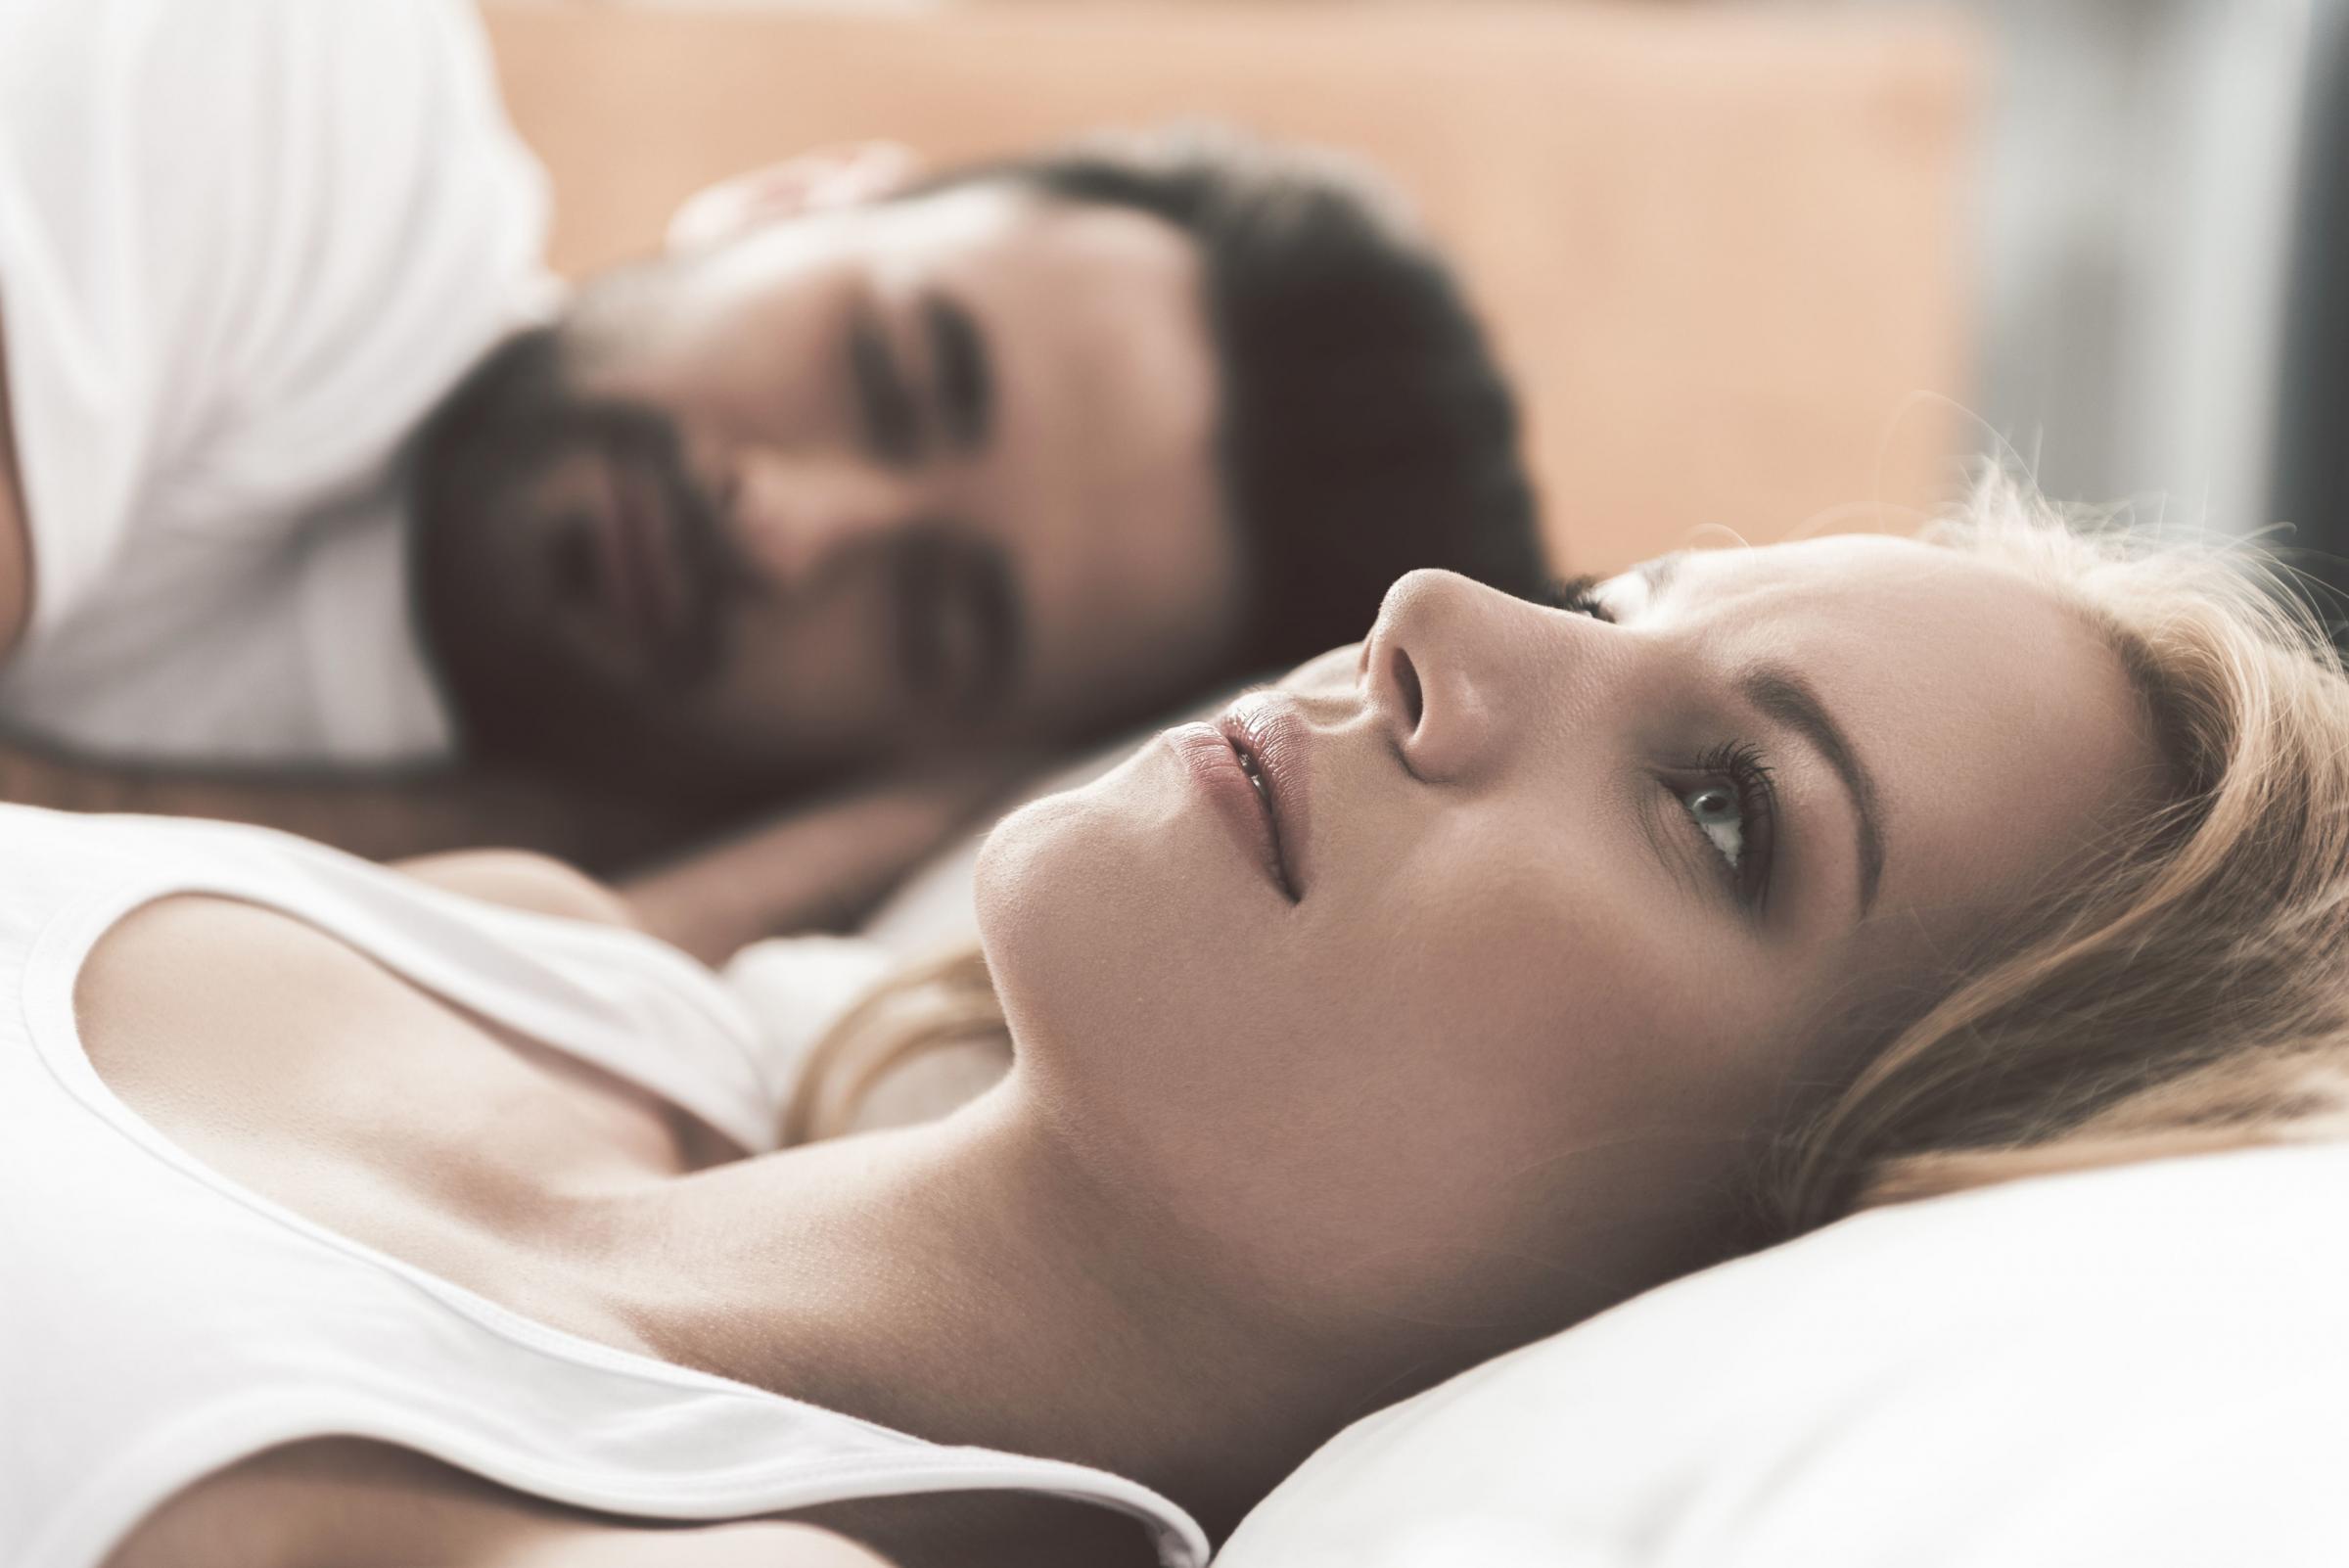 Is my husband still having an affair